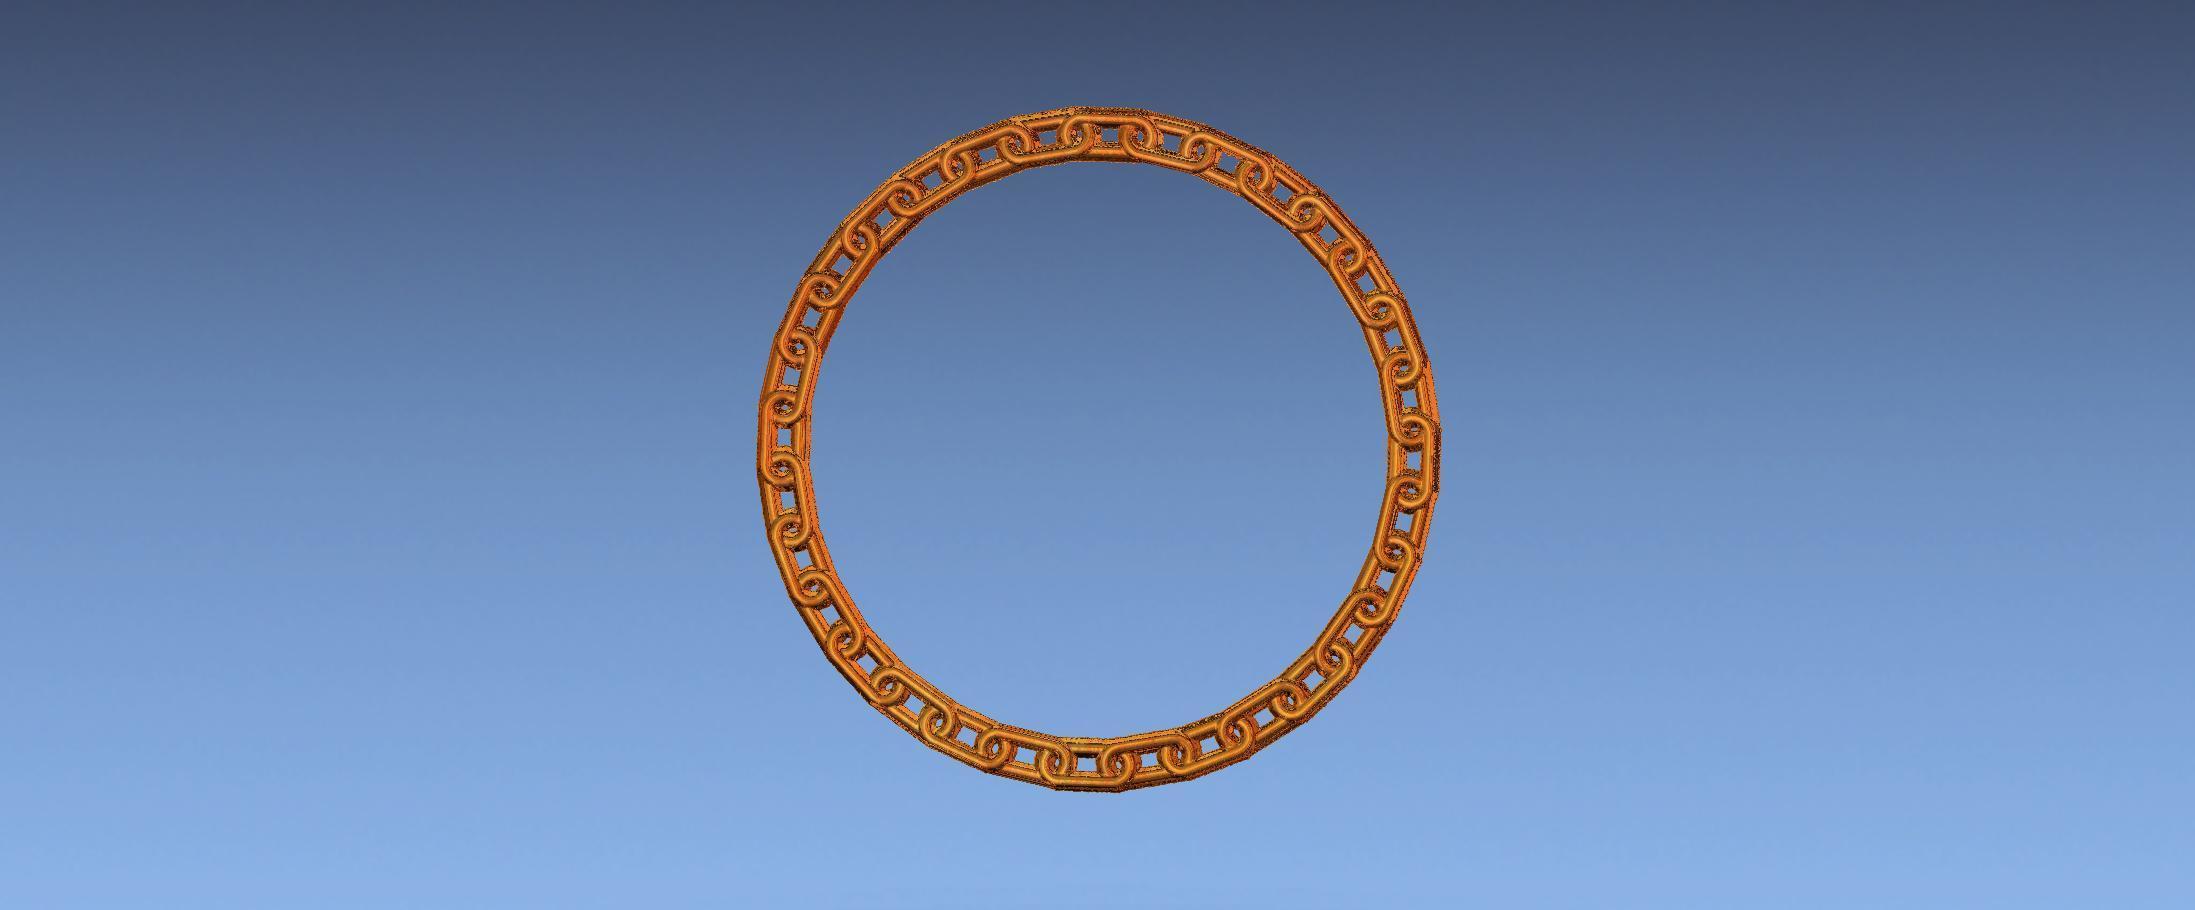 1.jpg Download free STL file chain border 3d stl file • 3D printing design, ALPHA_MENA